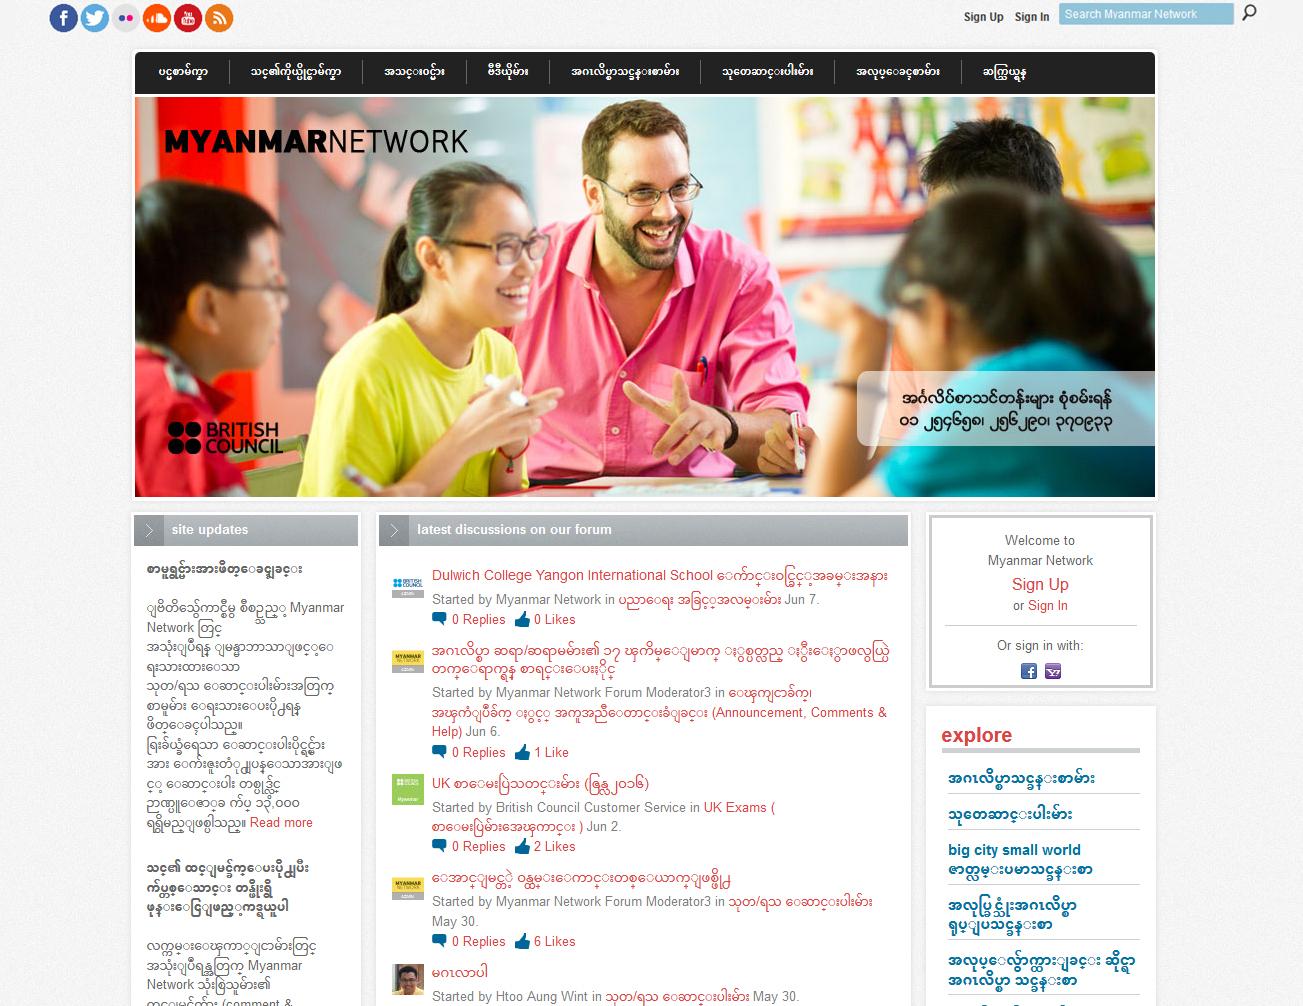 British Council Myanmar Update 2015 - Ning 2.0 Design